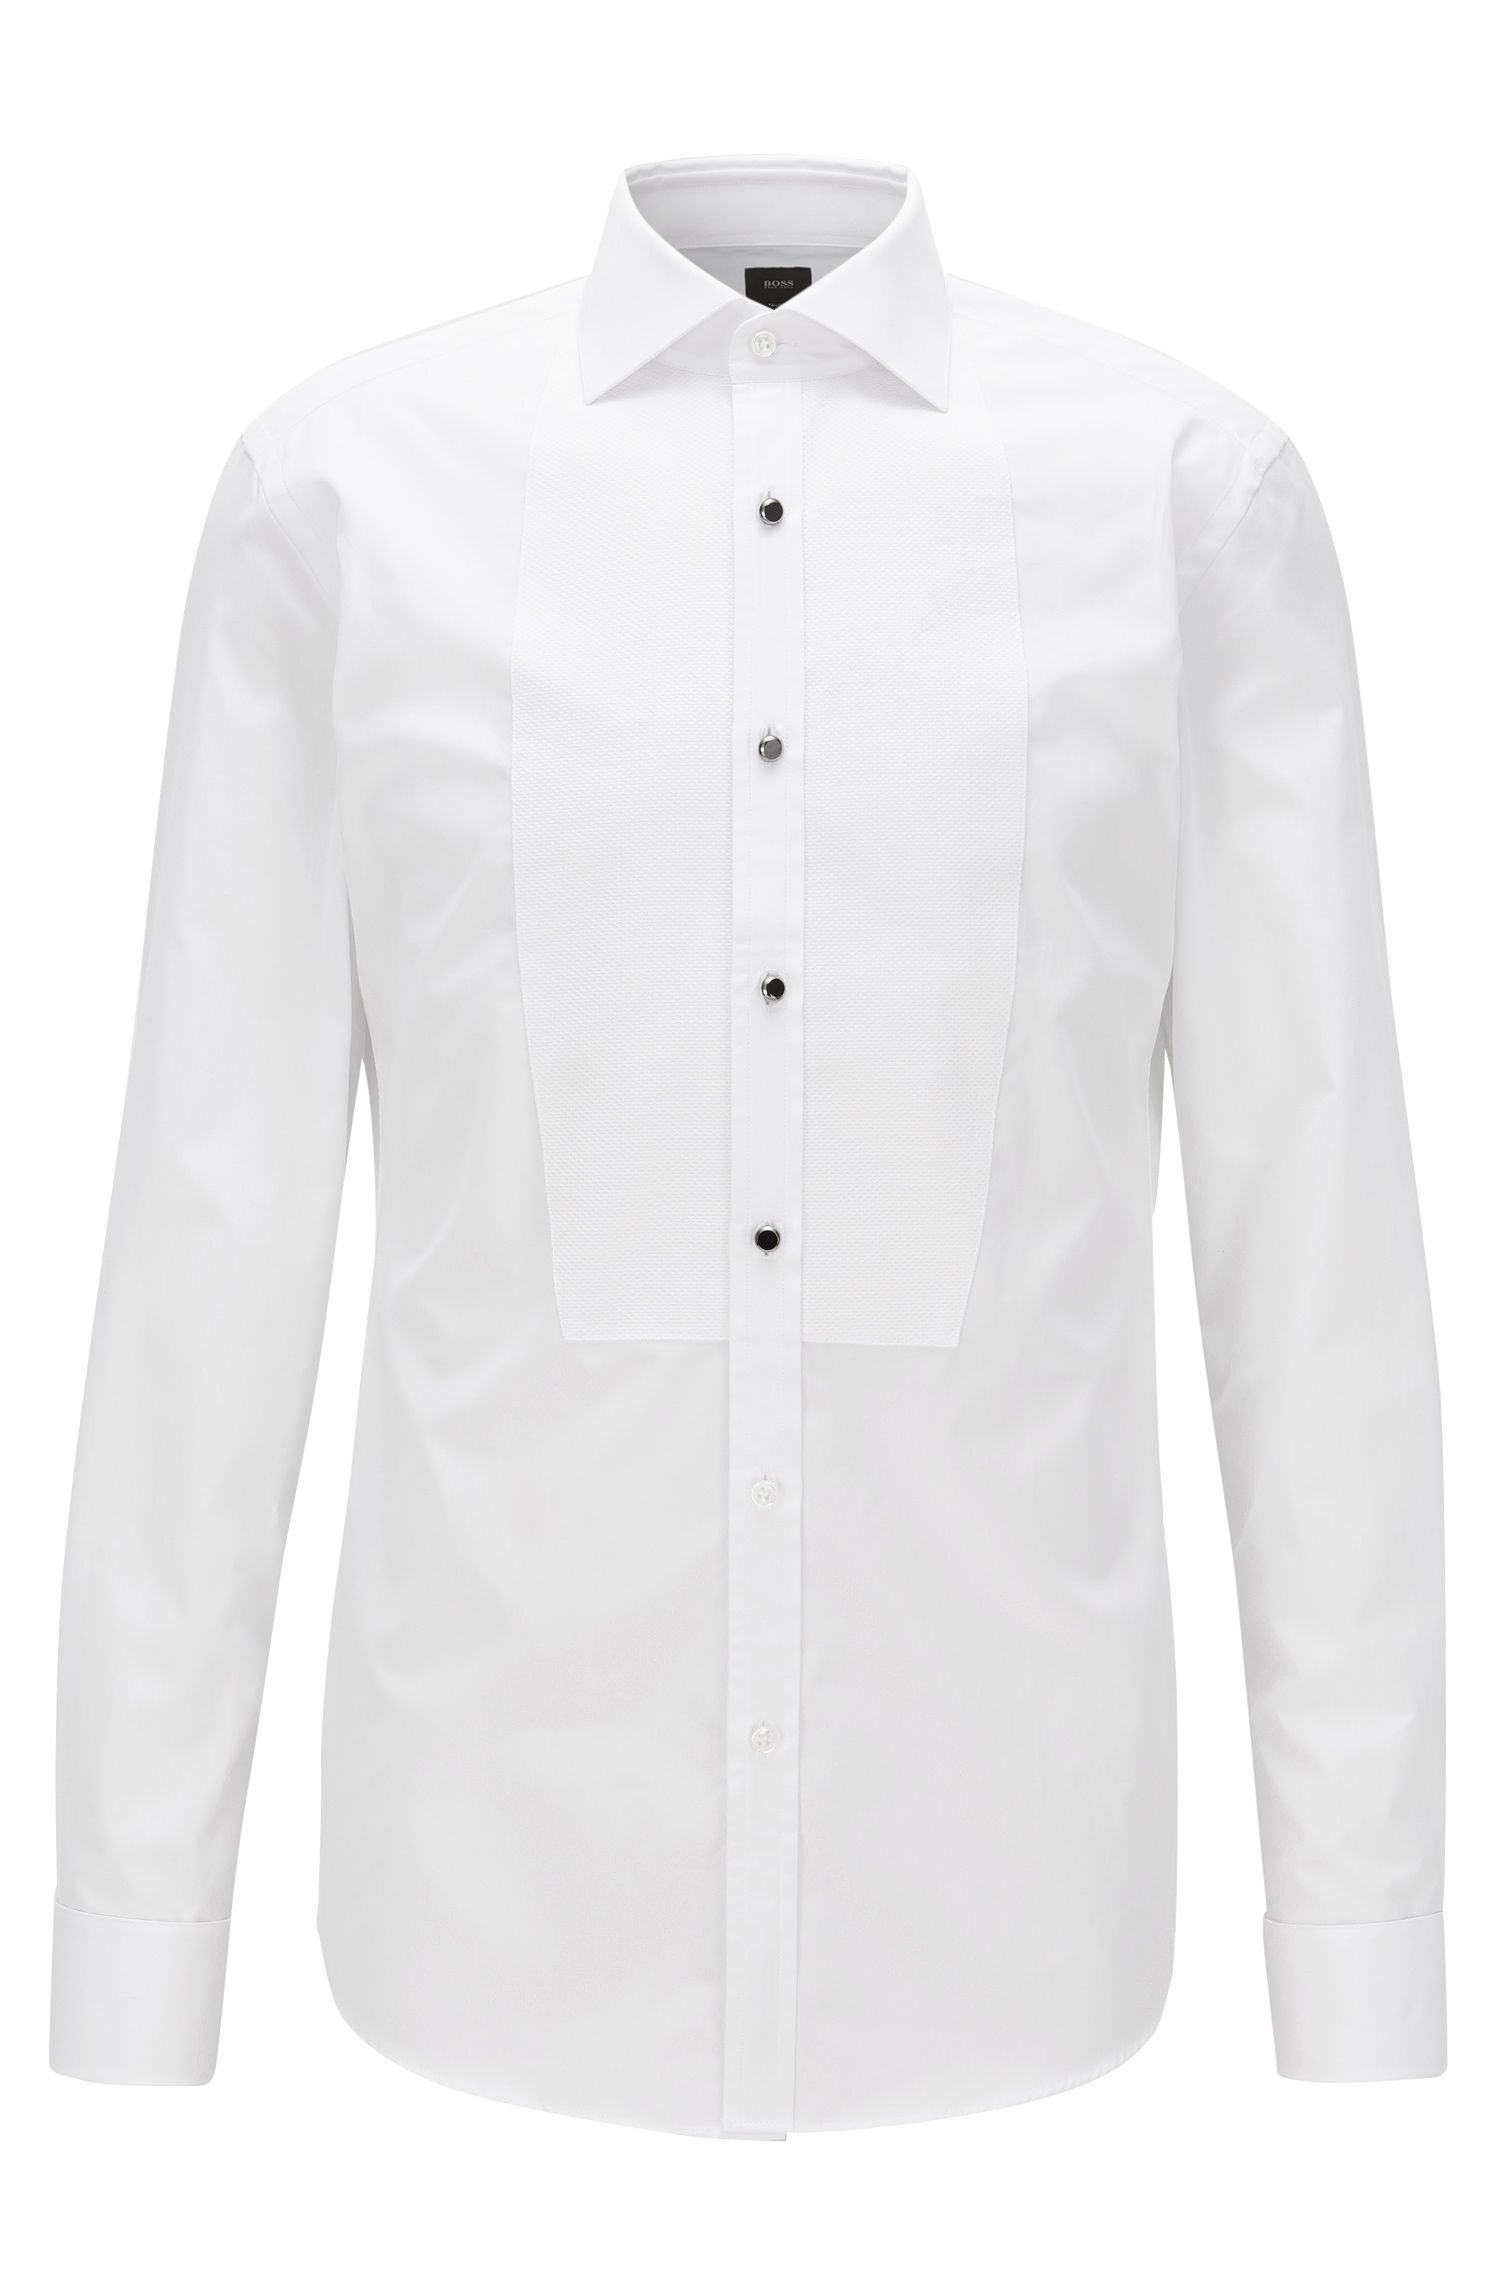 Dobby-Bib 2-Ply Cotton Tuxedo Shirt, Slim Fit | T-Calvin